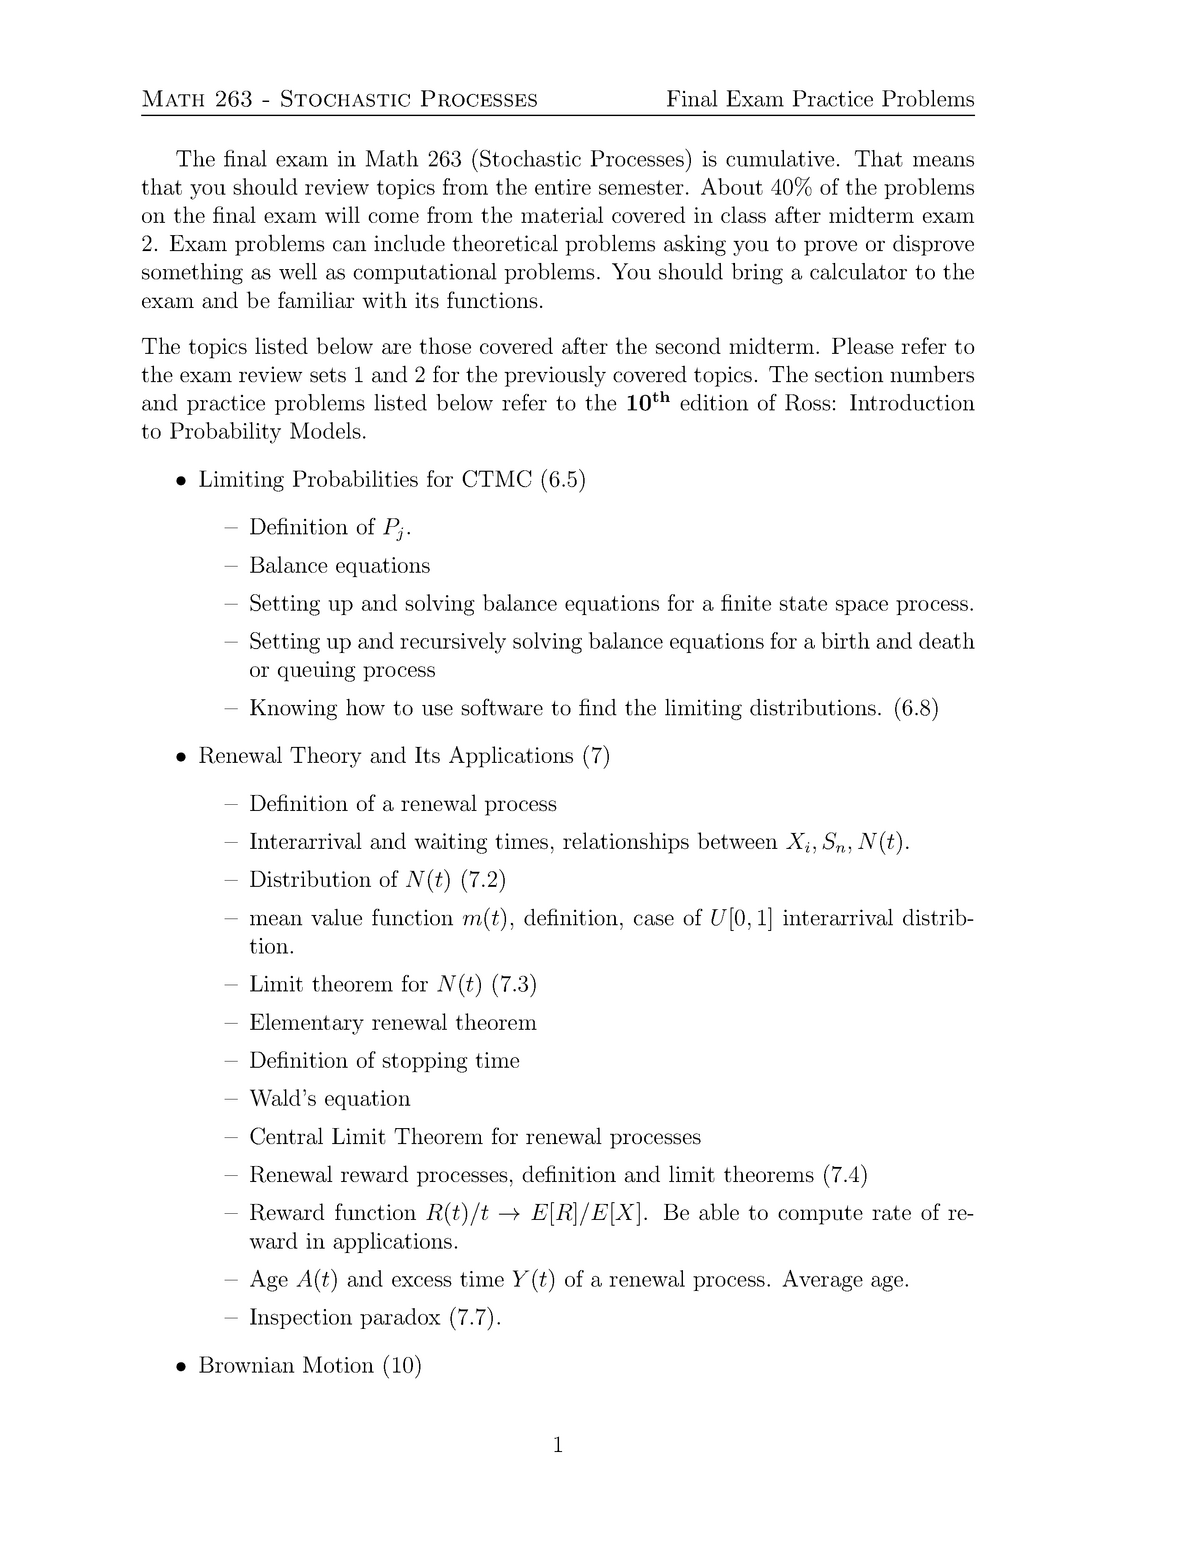 Exam Review 03 - MATH 263: Stochastic Processes - StuDocu